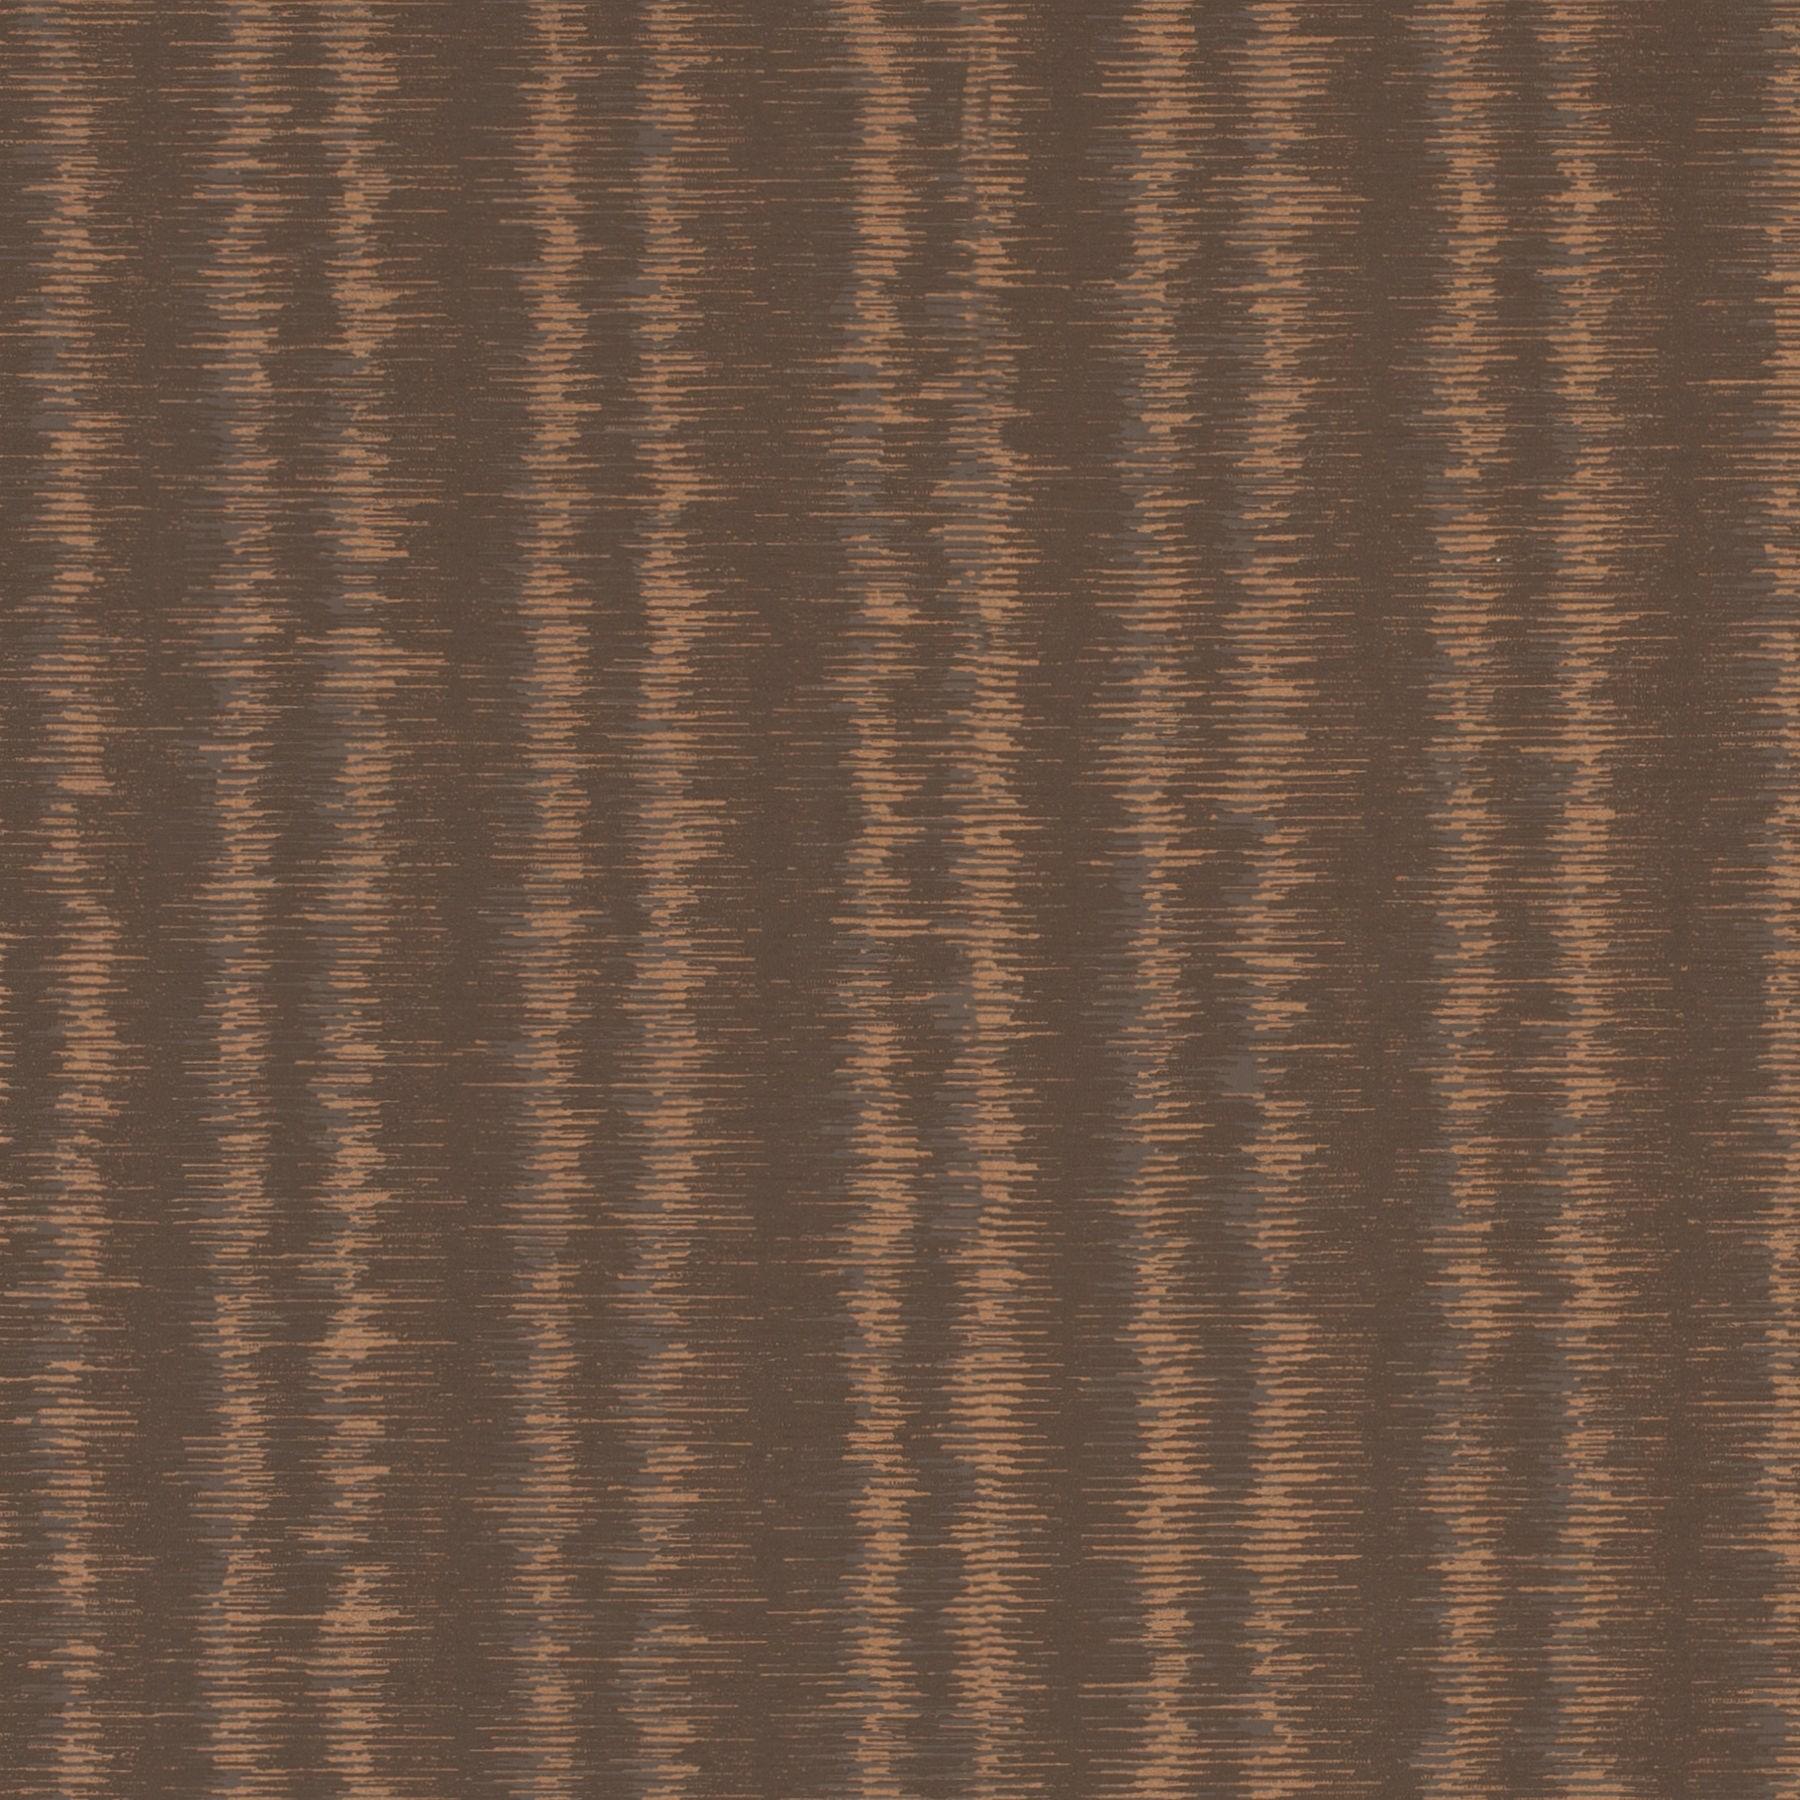 wallpapers ragtime 4 4048 060 jab anstoetz fabrics. Black Bedroom Furniture Sets. Home Design Ideas